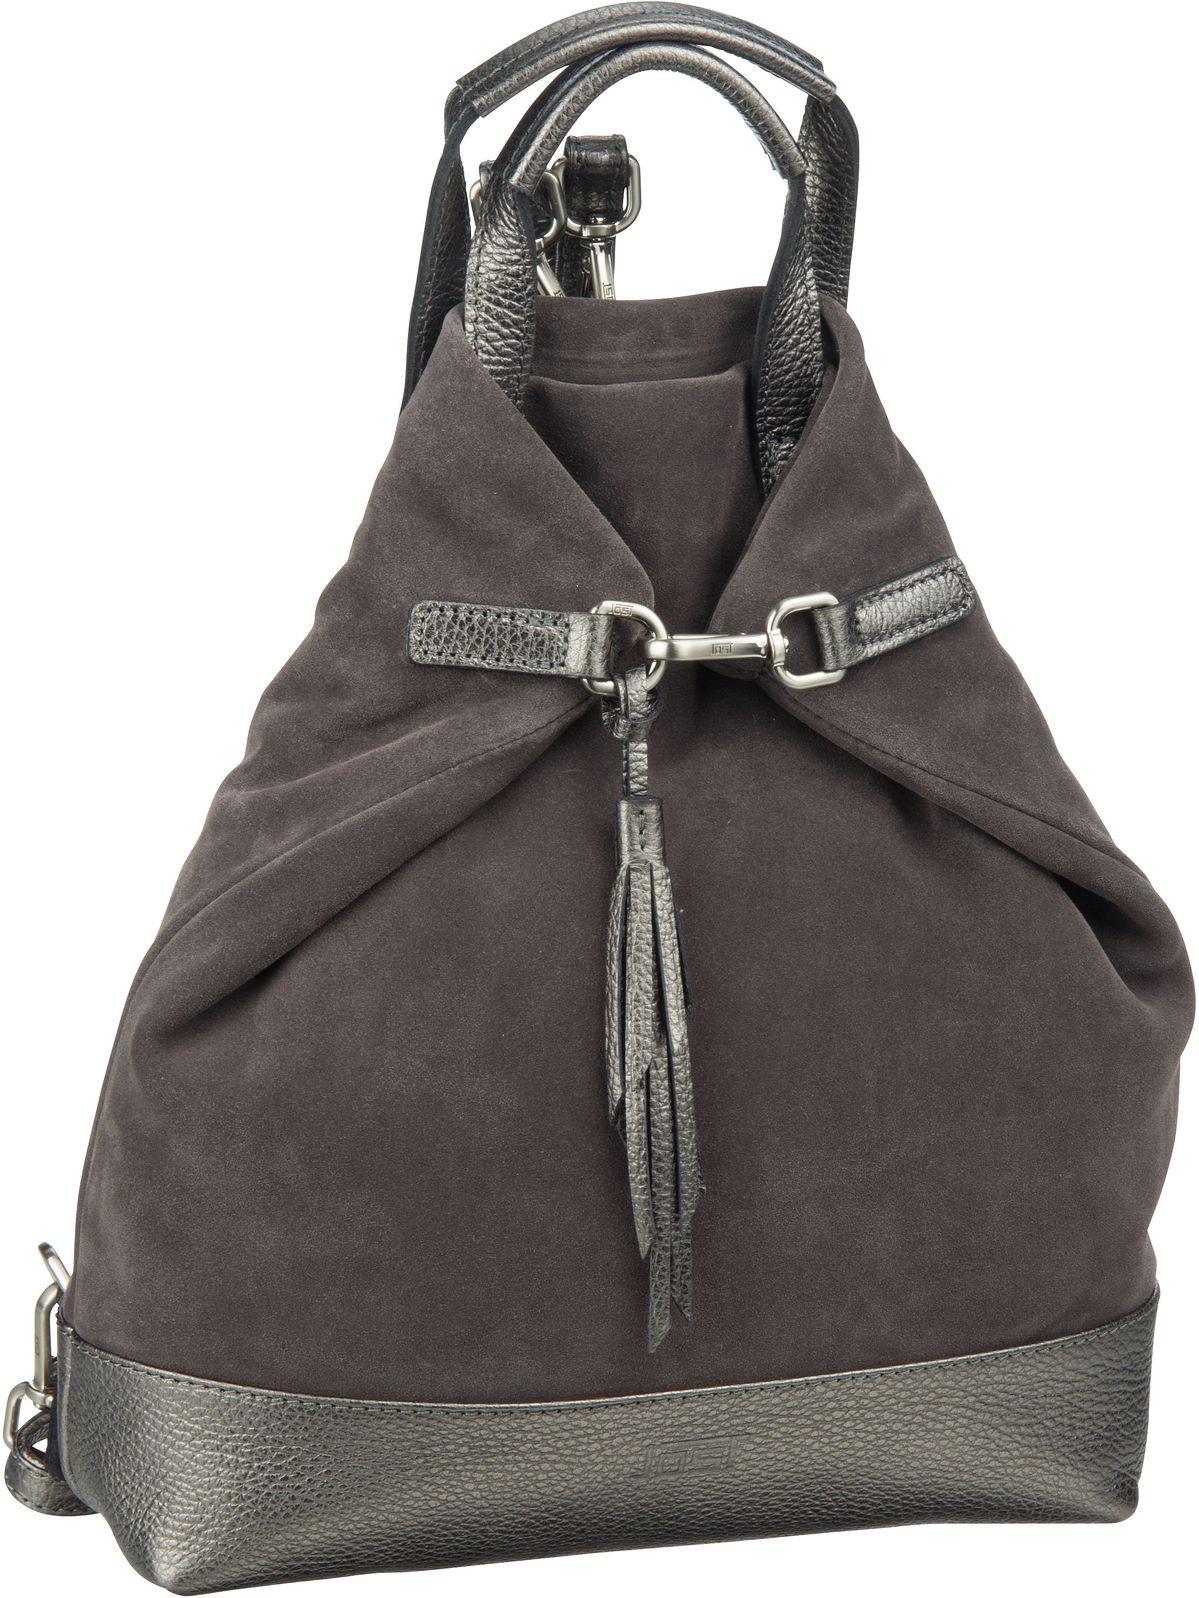 Rucksack / Daypack Motala 1729 X-Change 3in1 Bag XS Silver